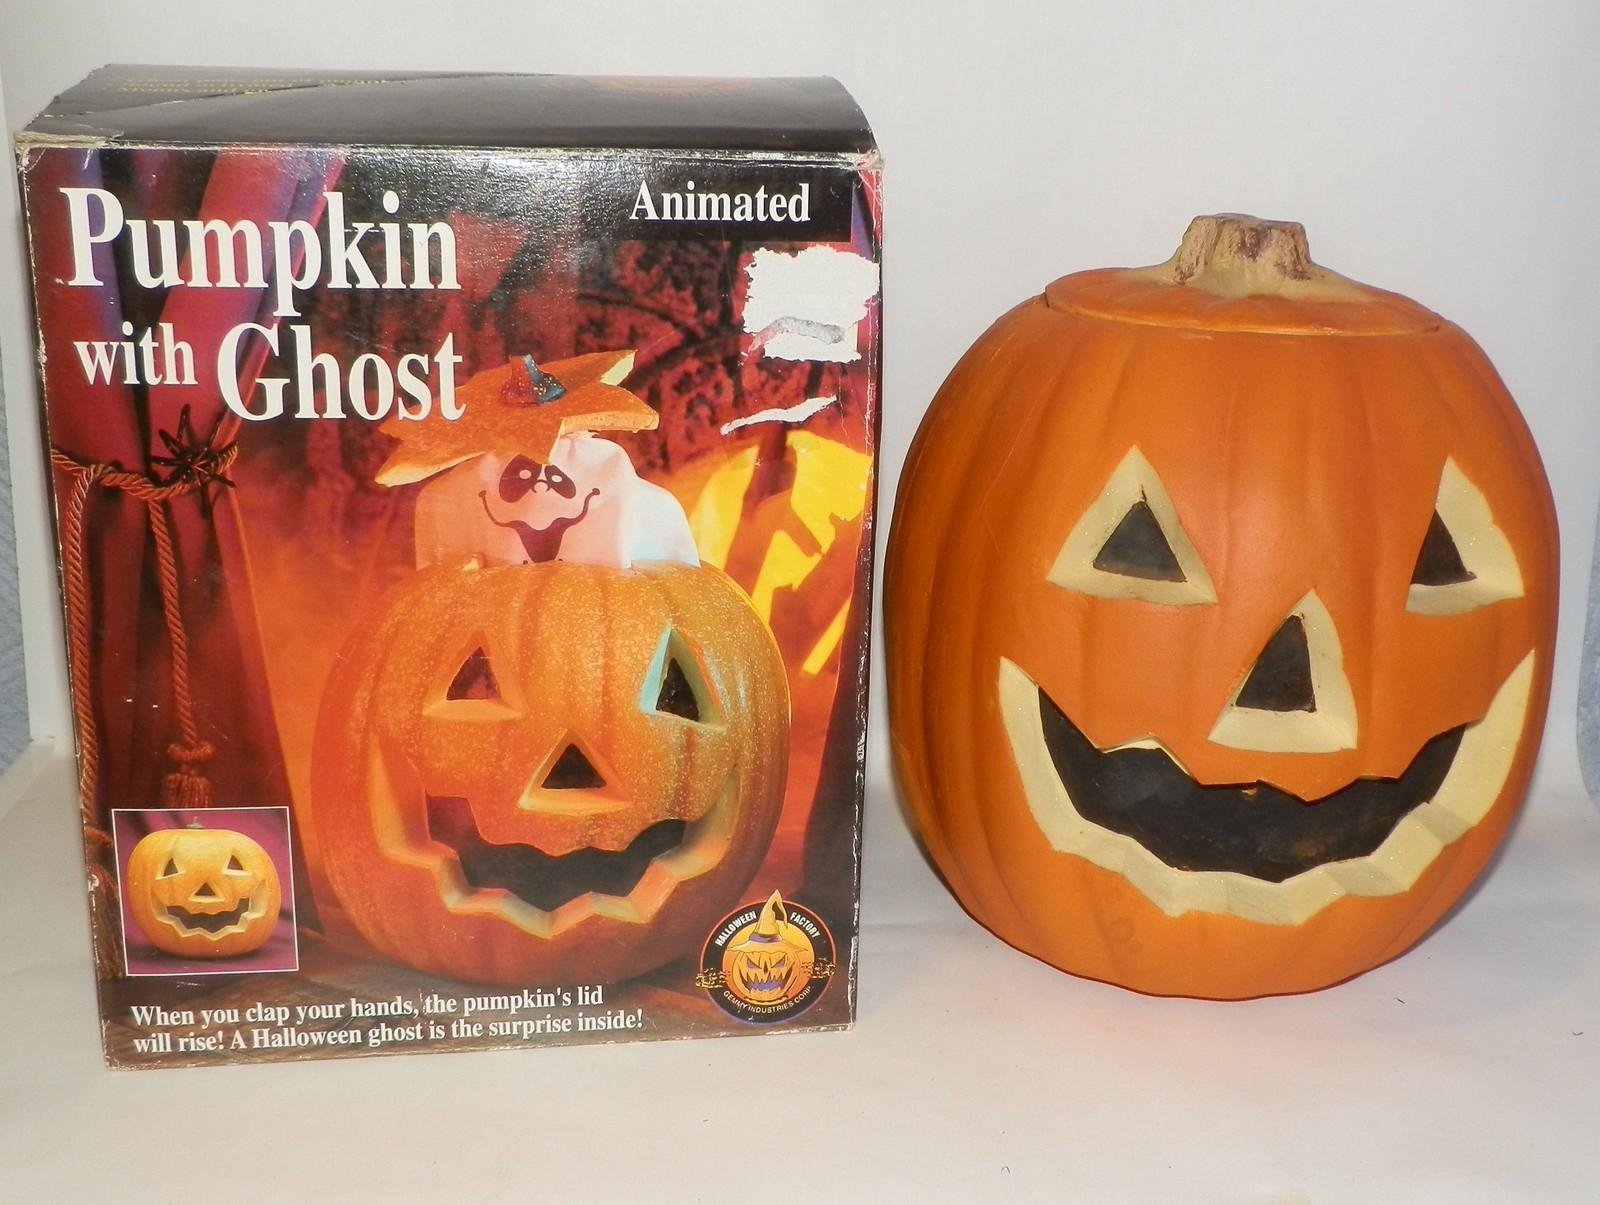 image - animated ghost in pumpkin | gemmy wiki | fandom powered